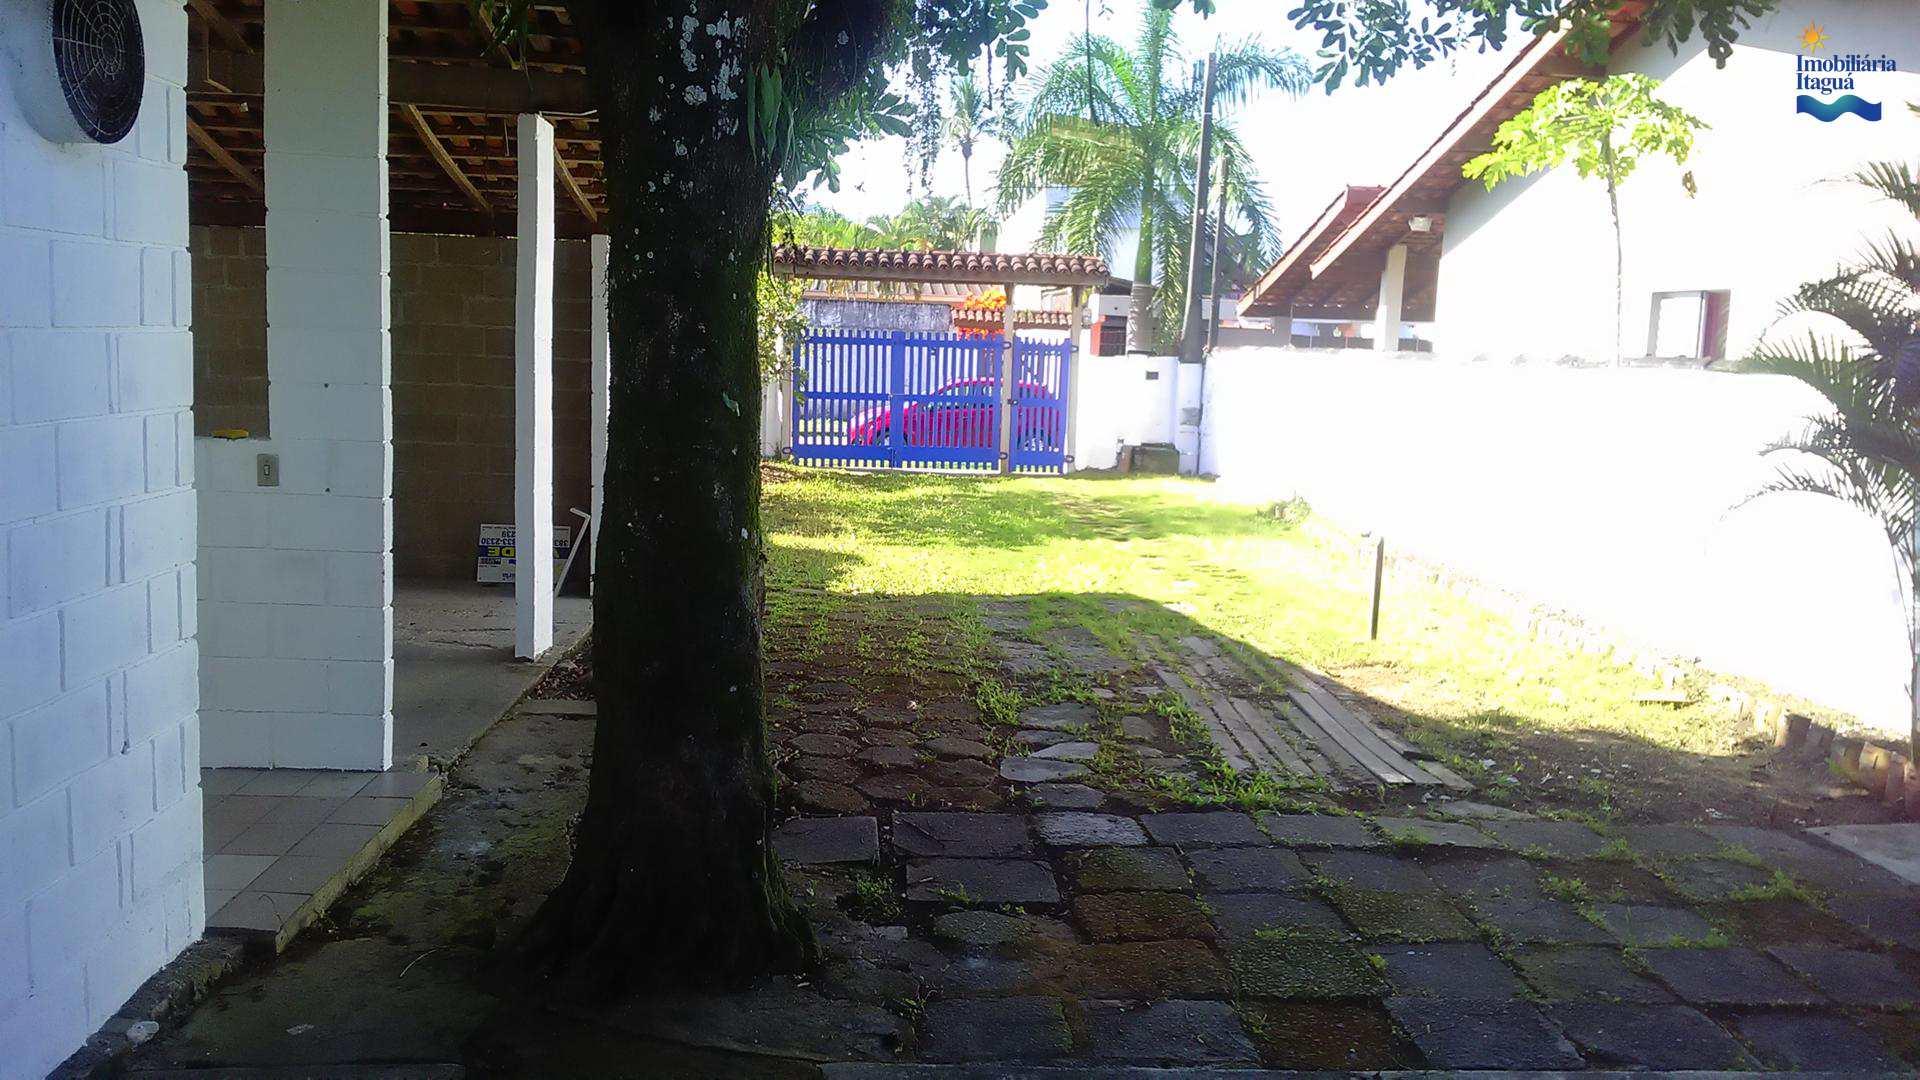 P_20180713_102143_HDR